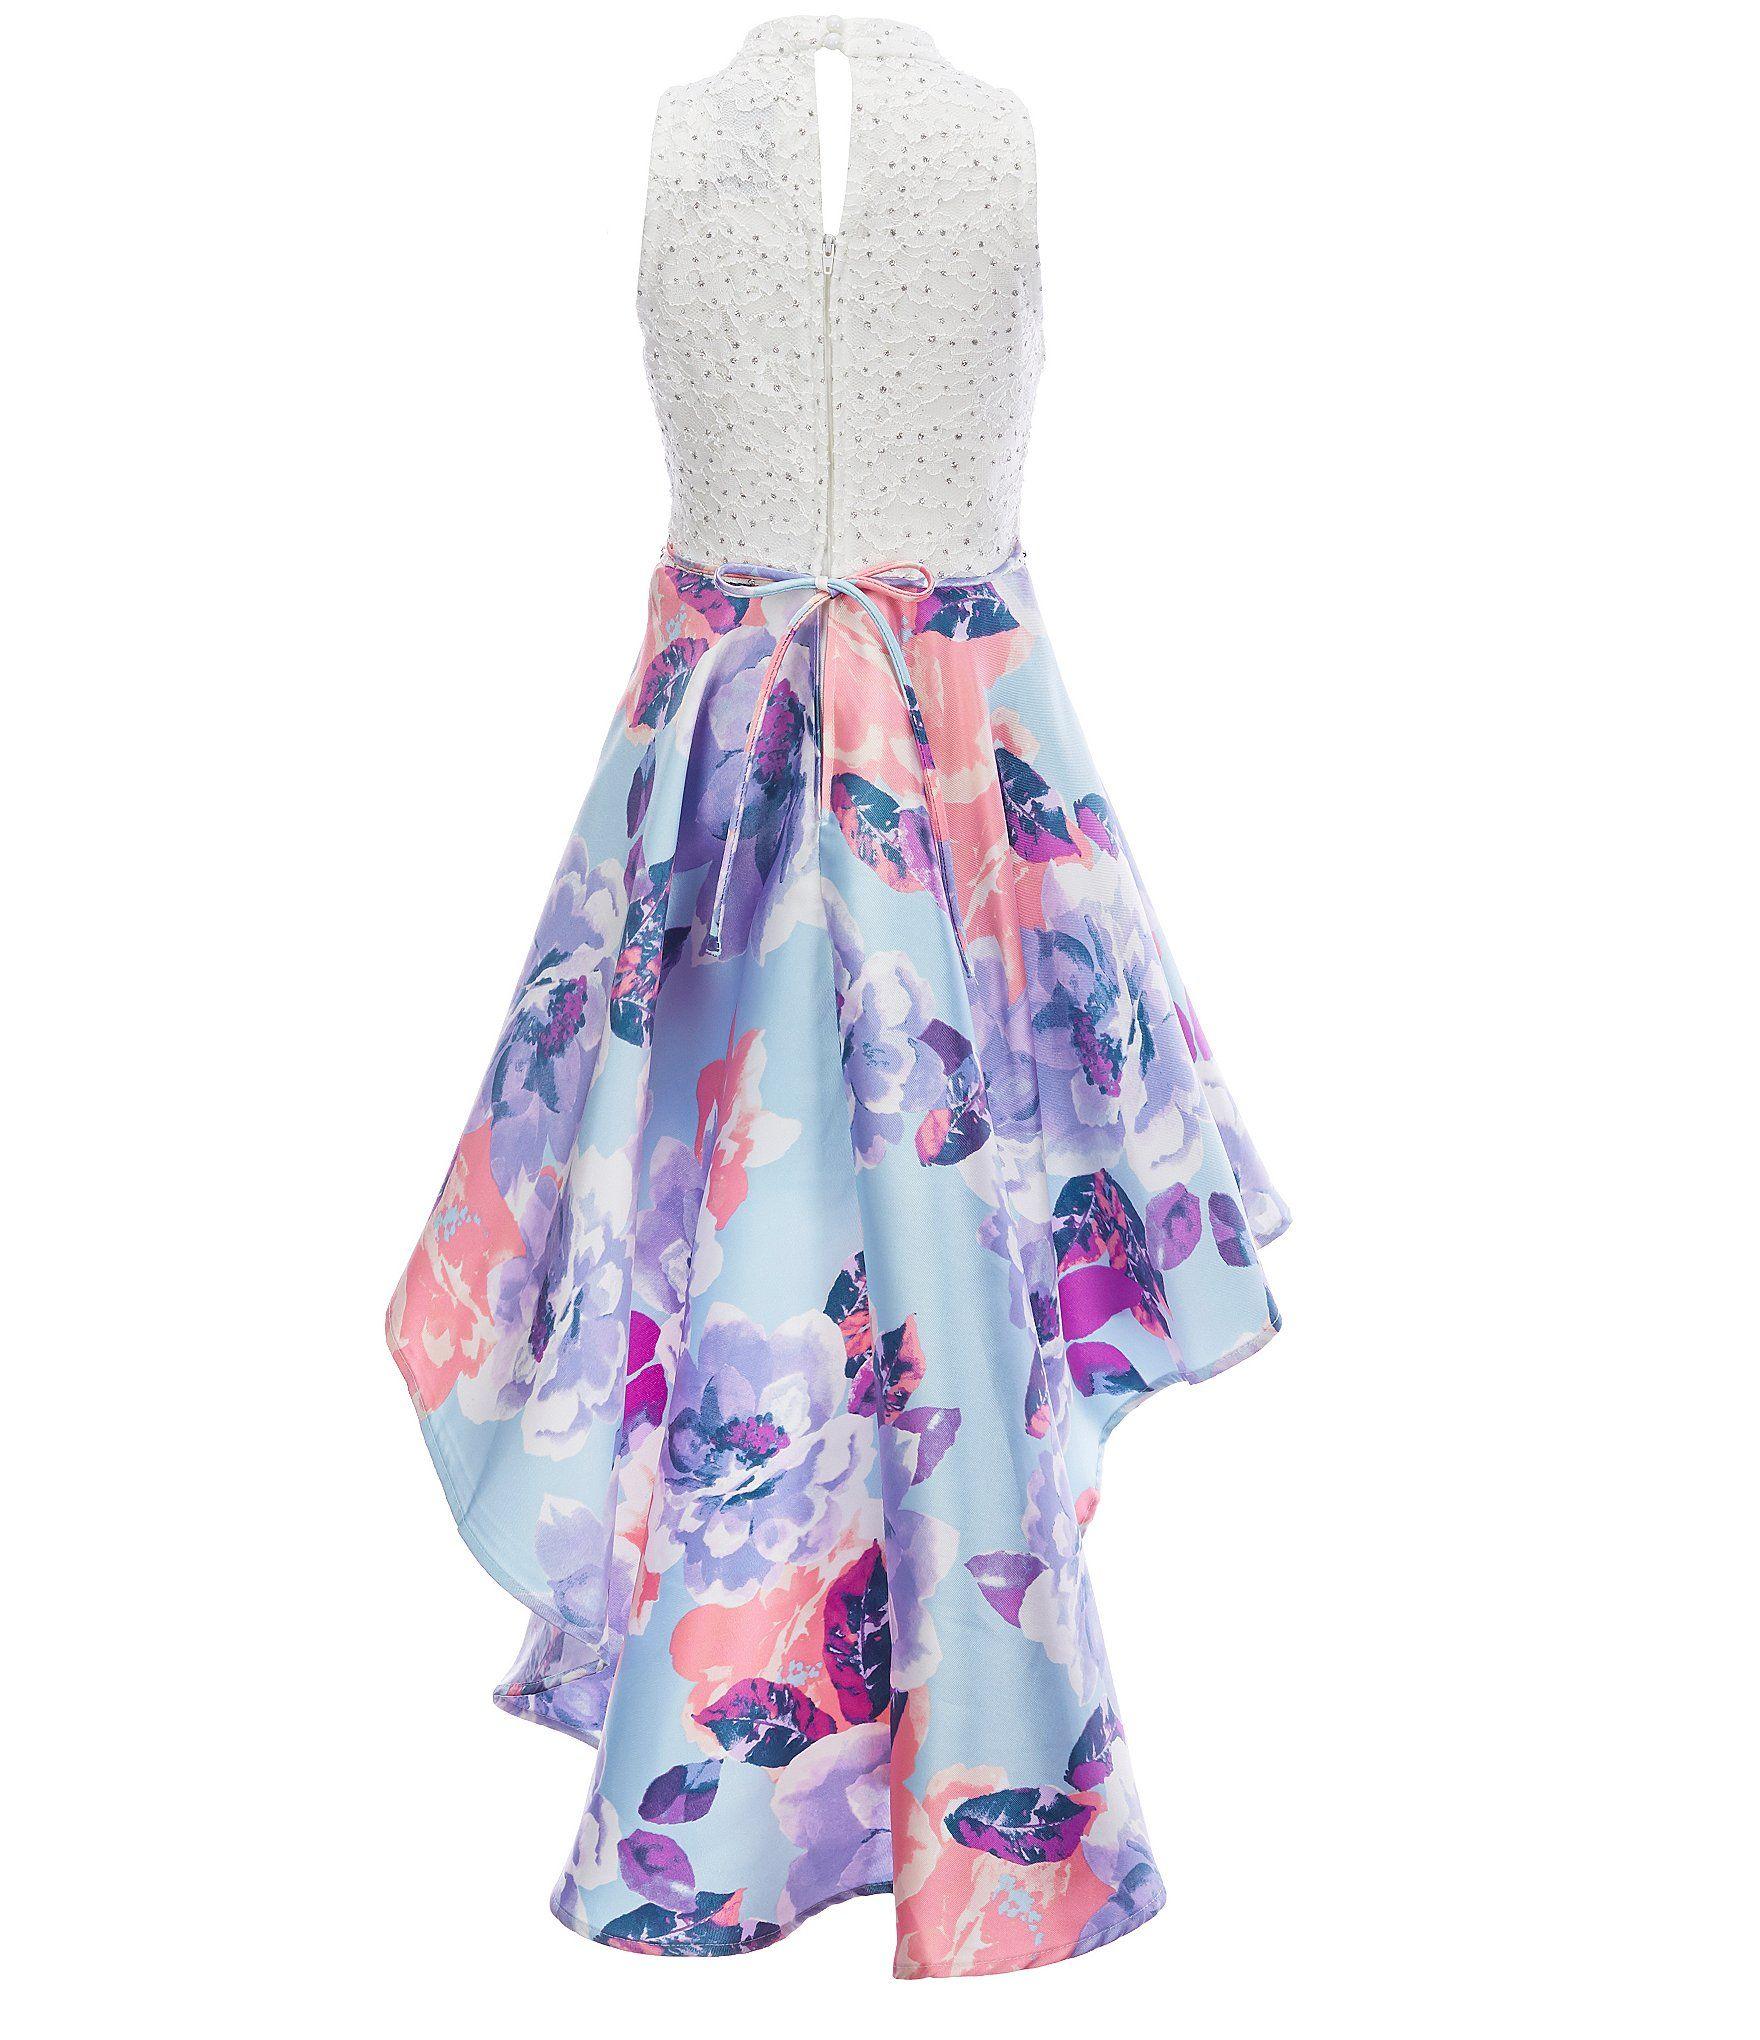 Xtraordinary Big Girls 7-16 Illusion Lace/Floral-Mikado Hi-Low Dress | Dillard's -   16 DIY Clothes Lace girls ideas